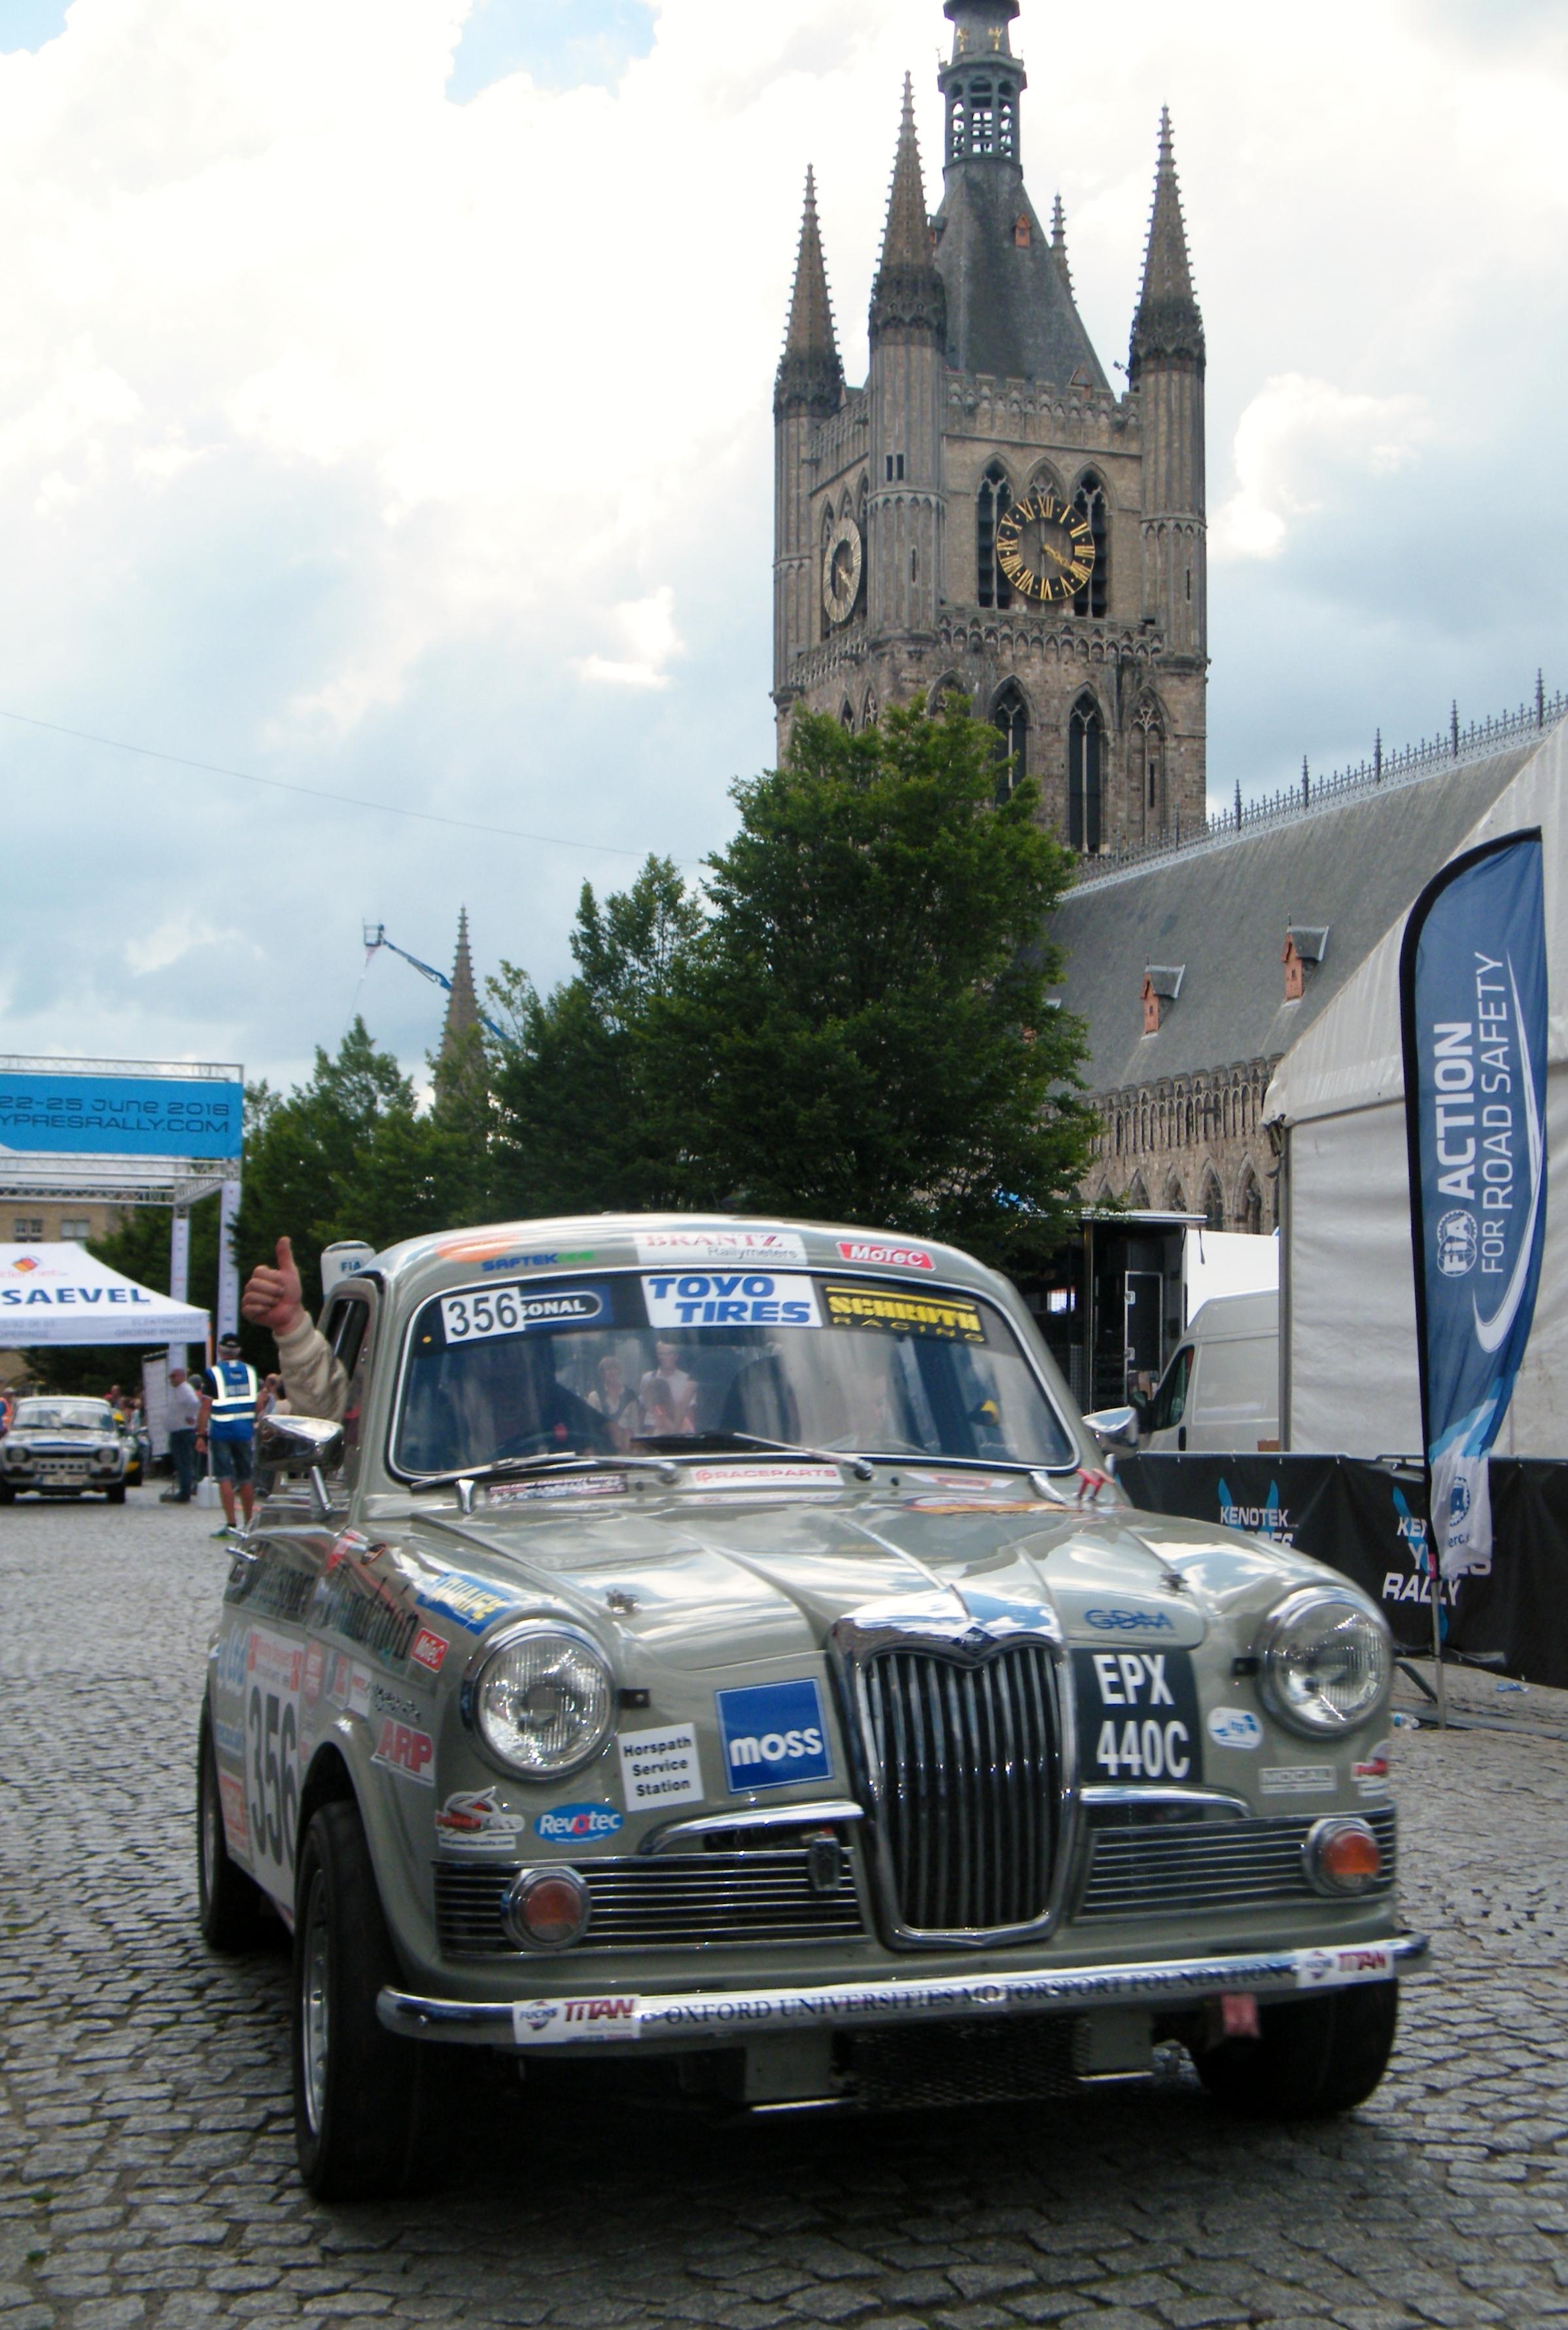 De Historics in Ypres  Be. 2016  Alain Mervilde